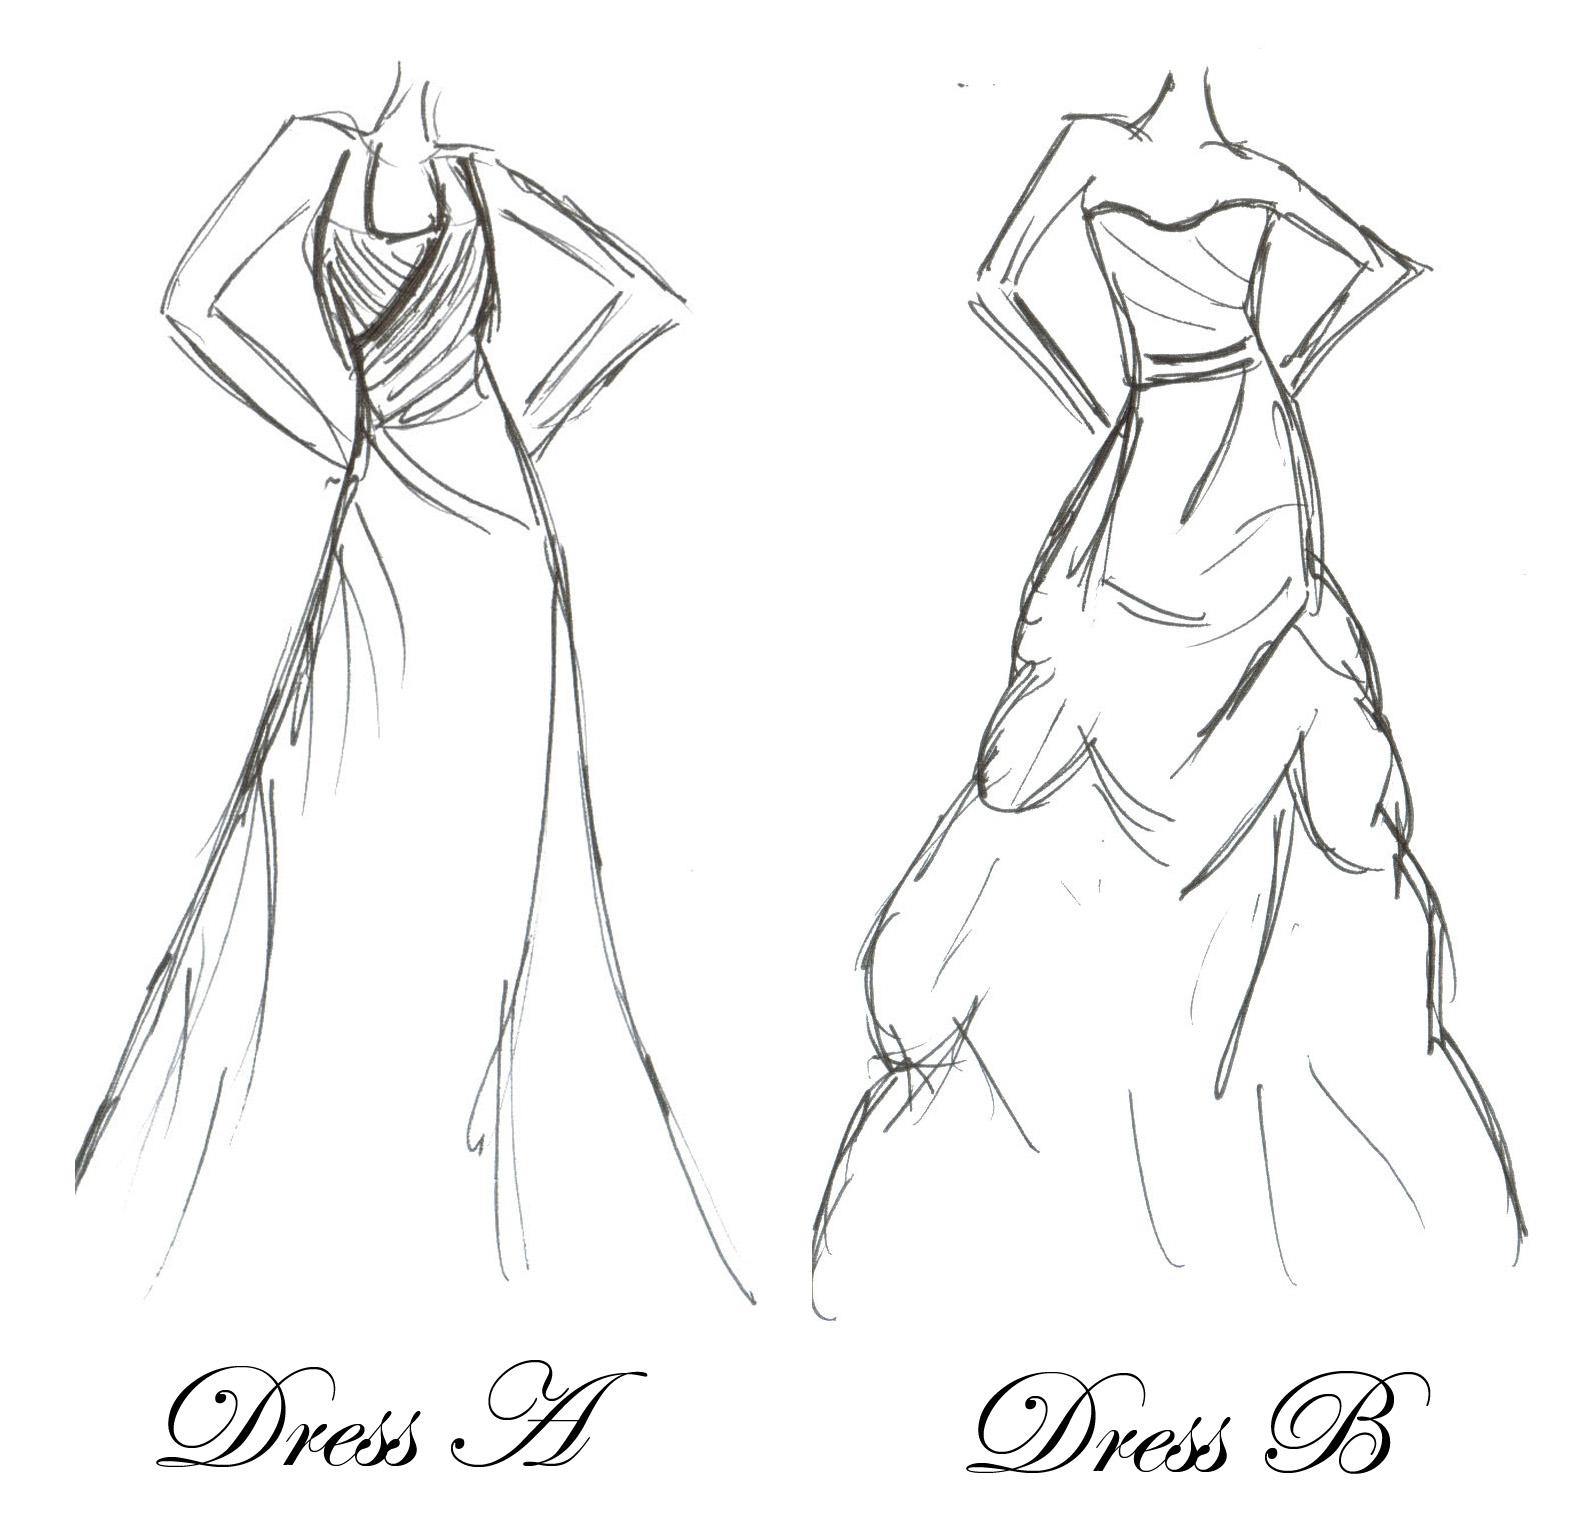 DIY Vintage Chic: Help Me Decide My Wedding Dress Style